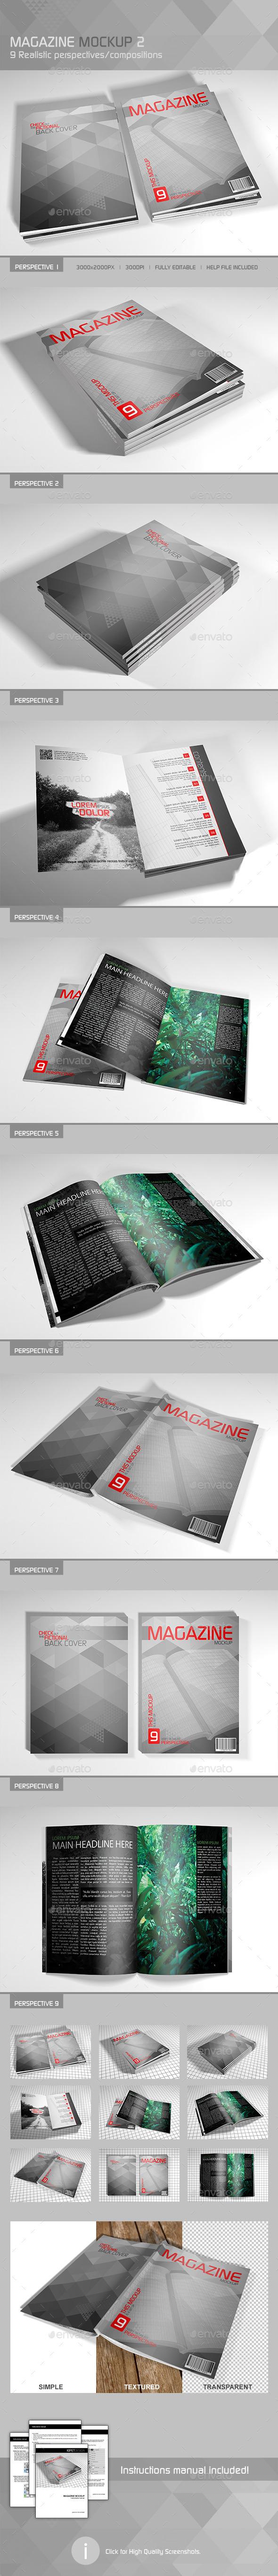 GraphicRiver Realistic Magazine Mockup 2 9362809